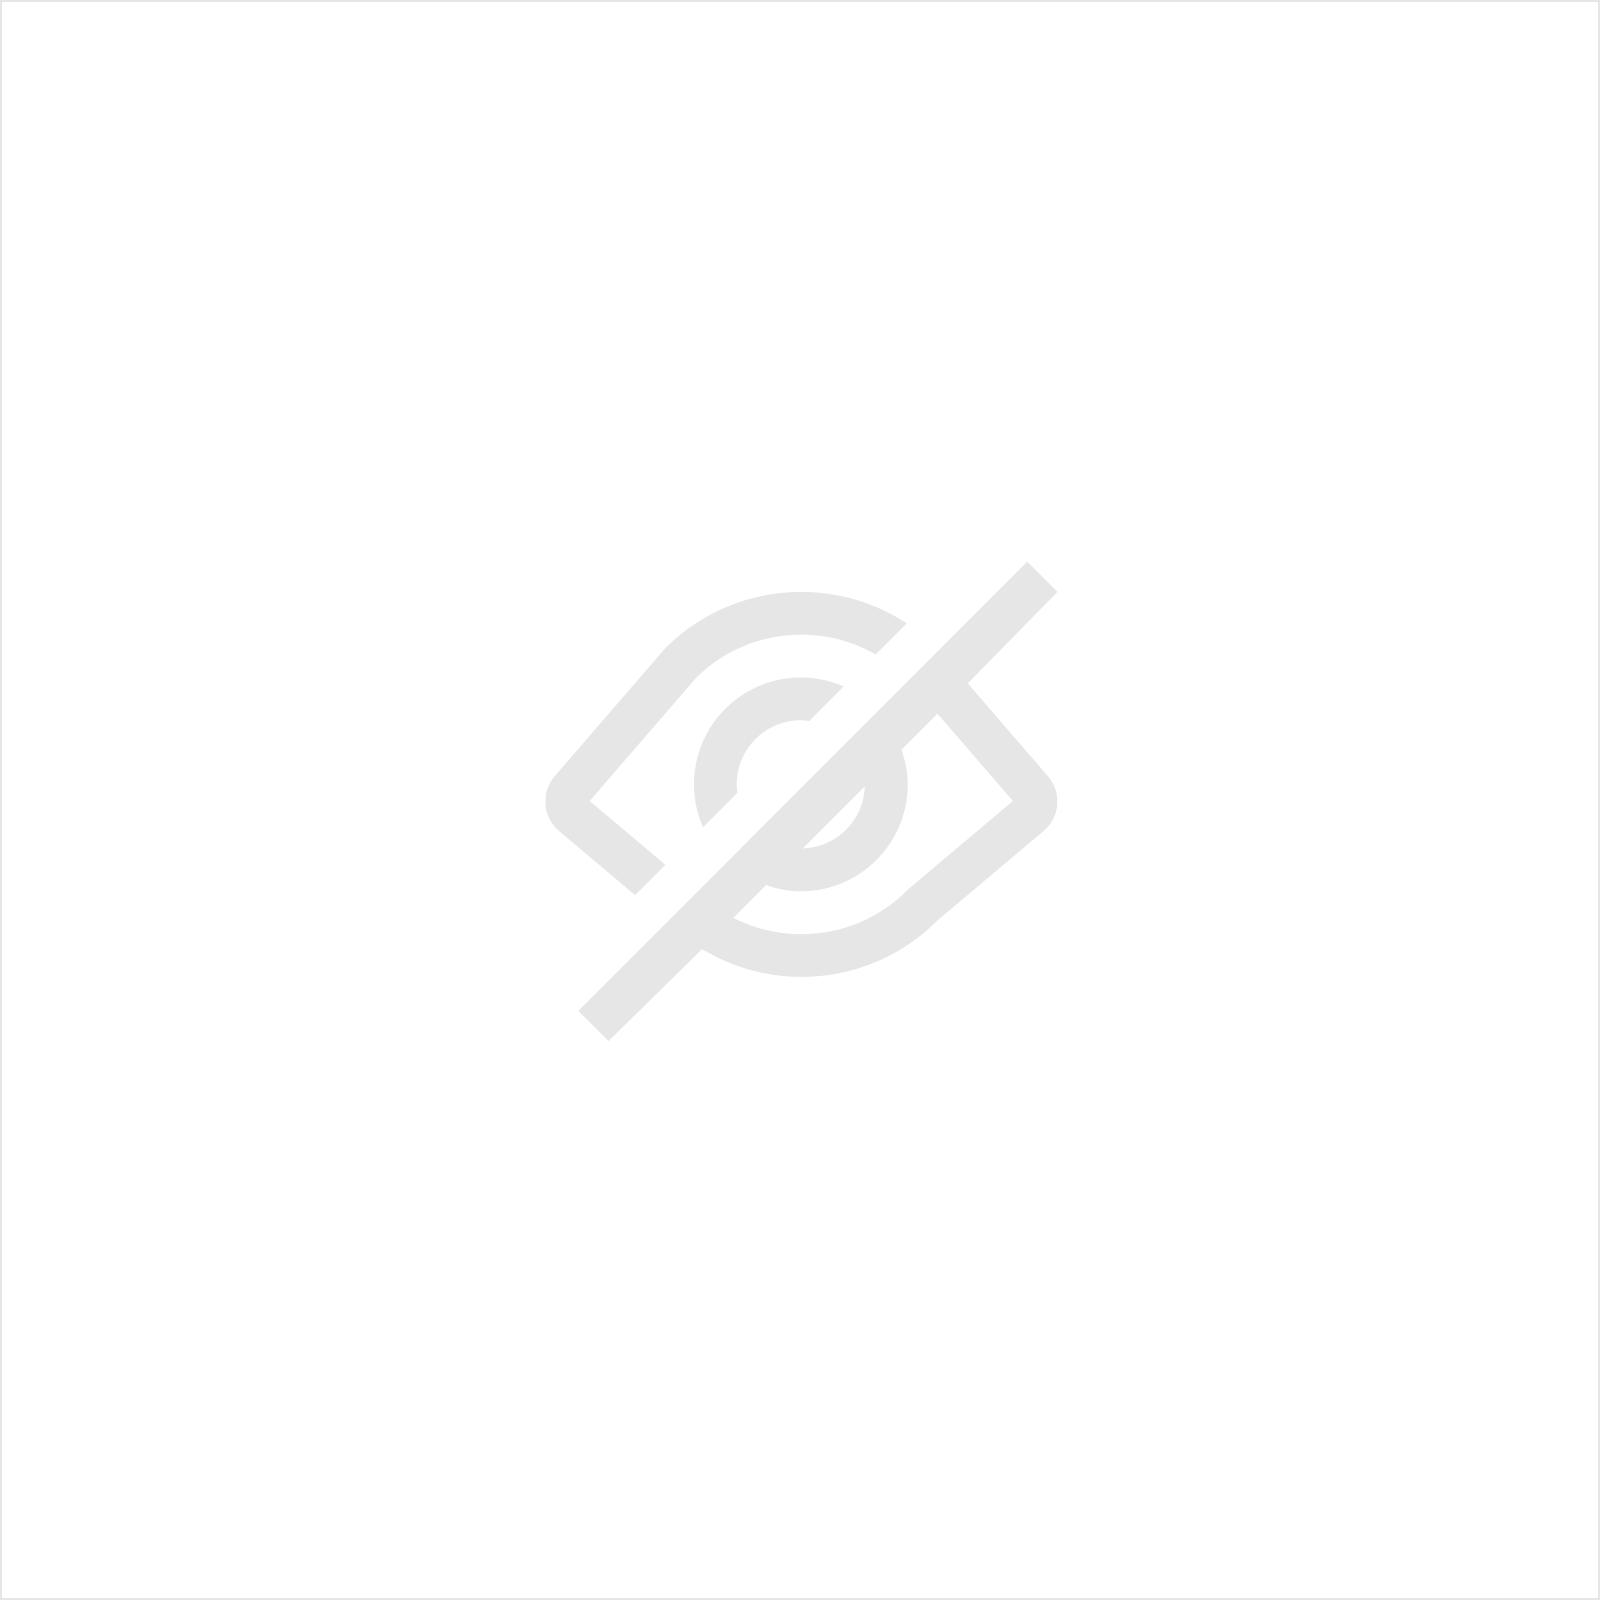 NOVOL - APPRÊT ÉPOXY ANTI-CORROSION 1 L (90042)